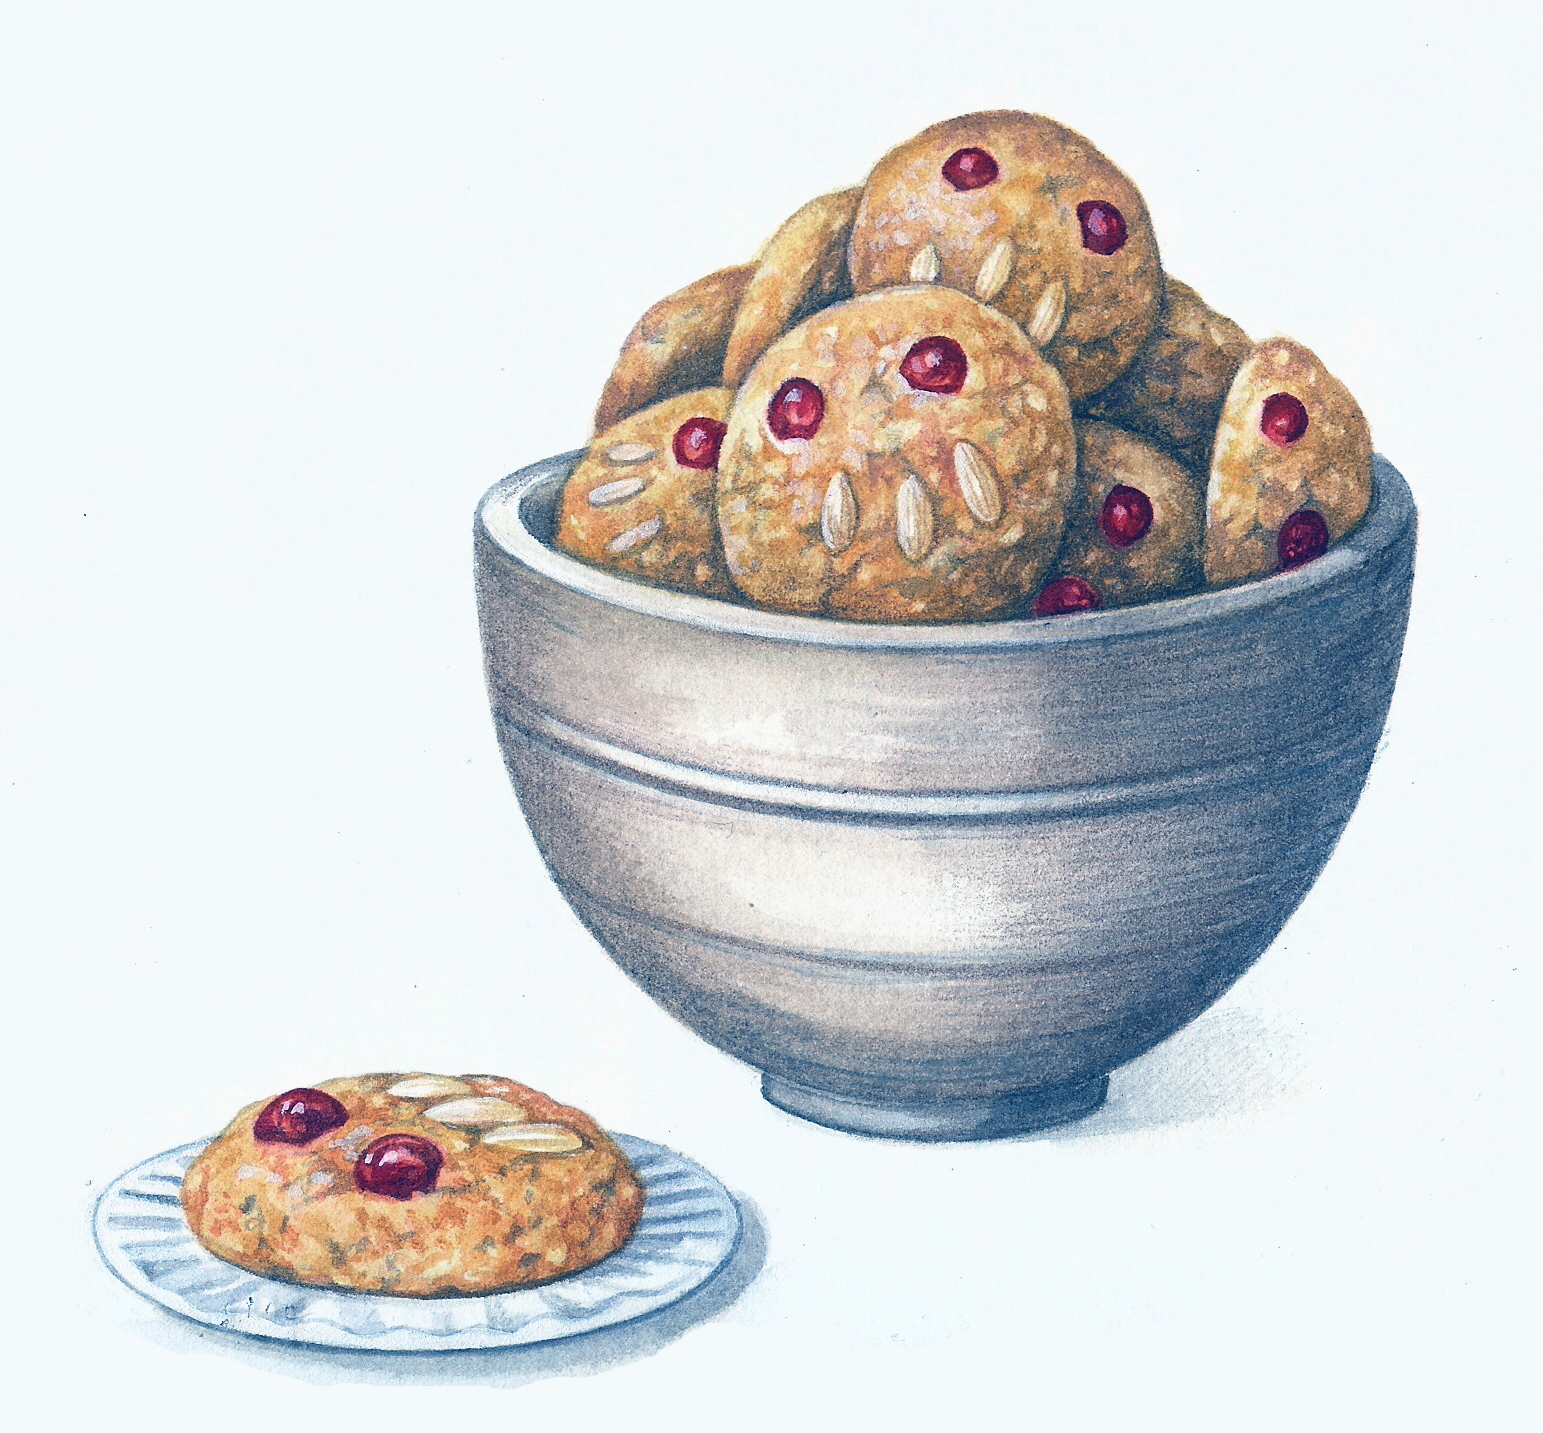 Rascal Cakes